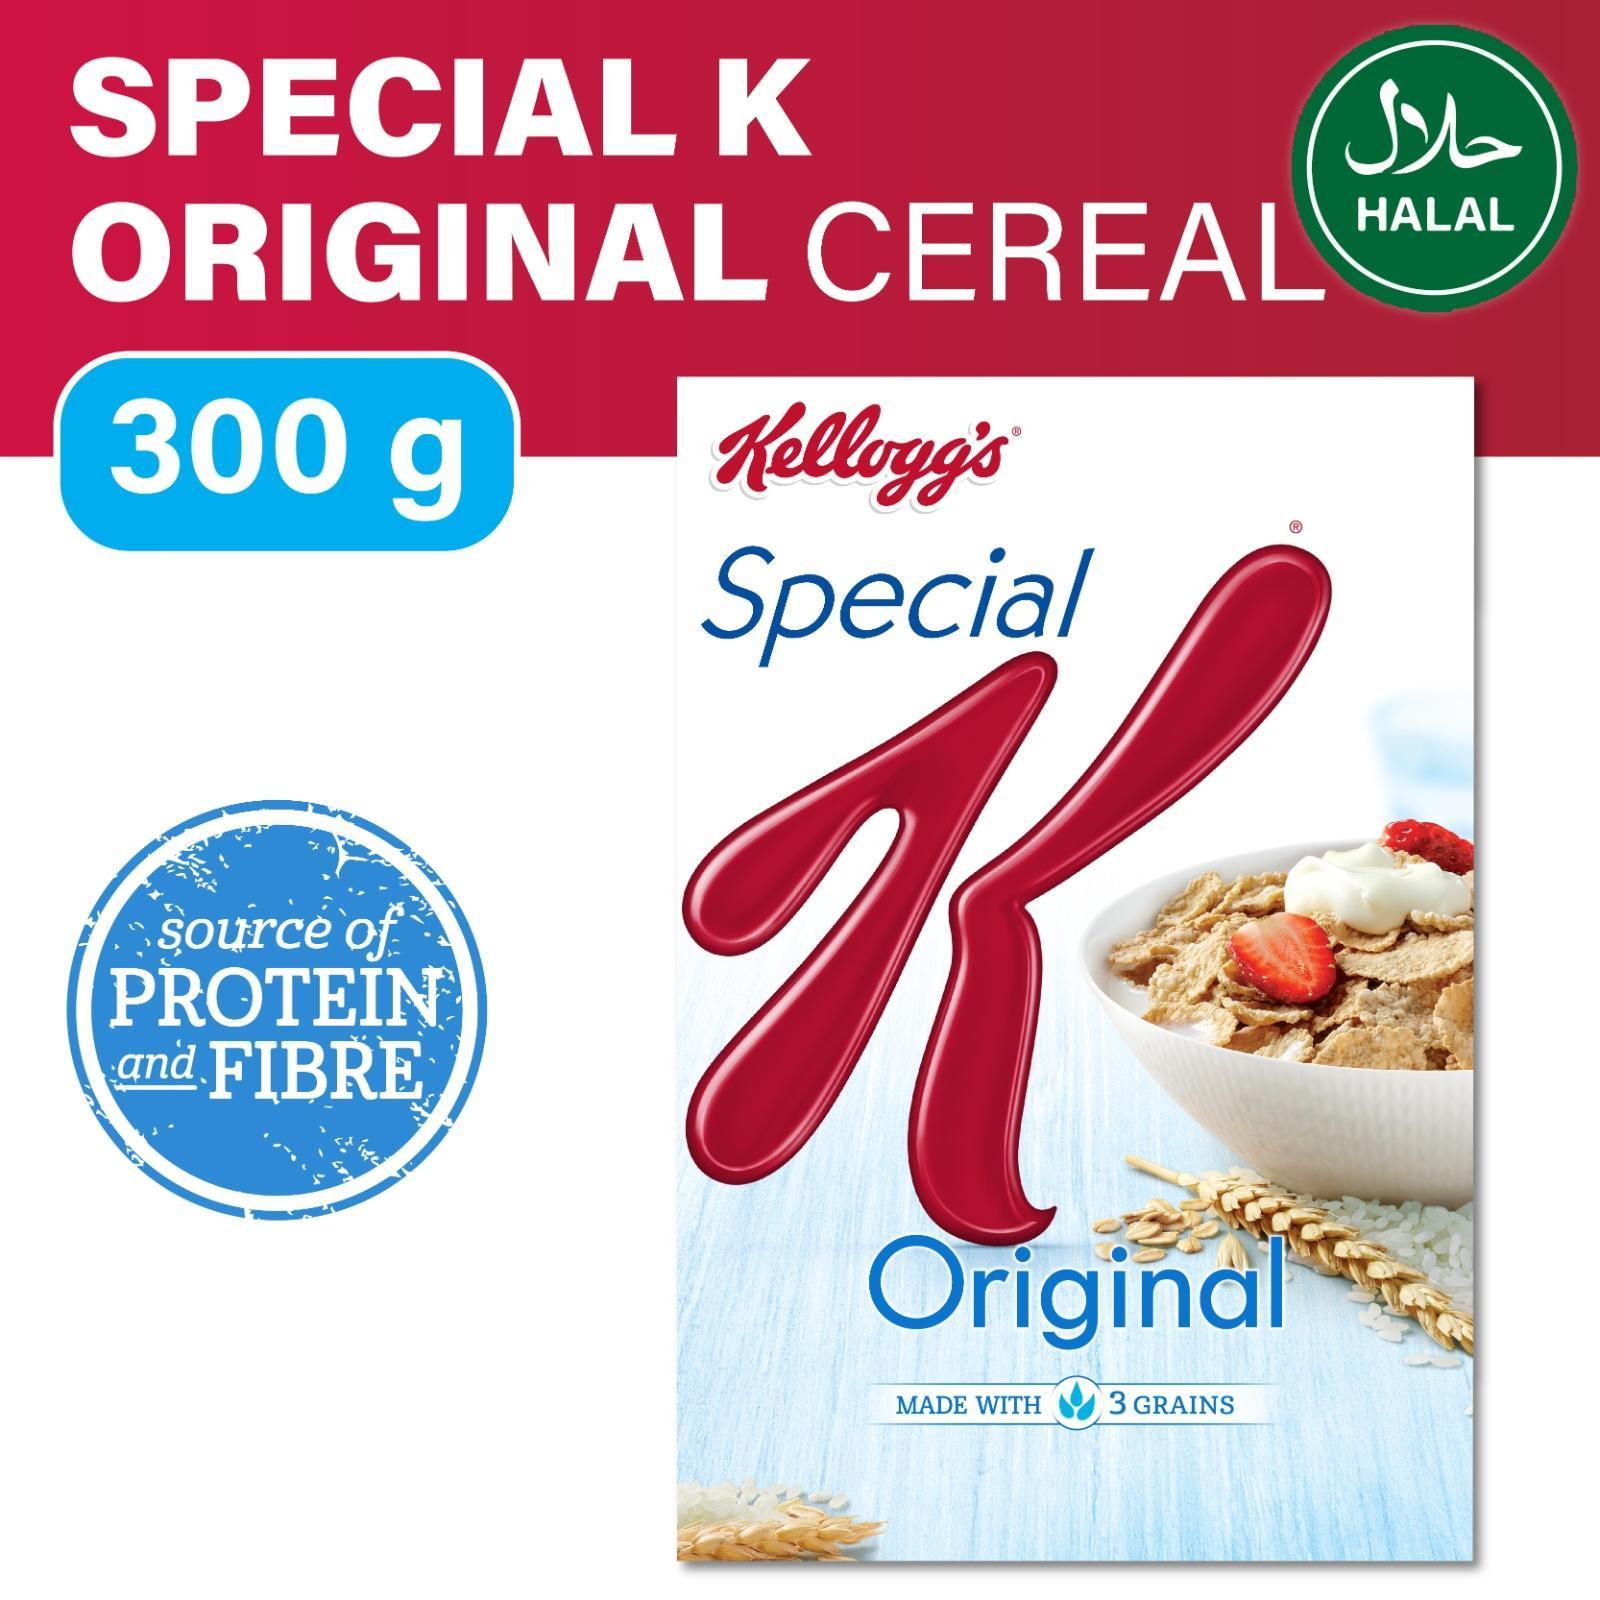 Kellogg's Special K Original Flavor Breakfast Cereal